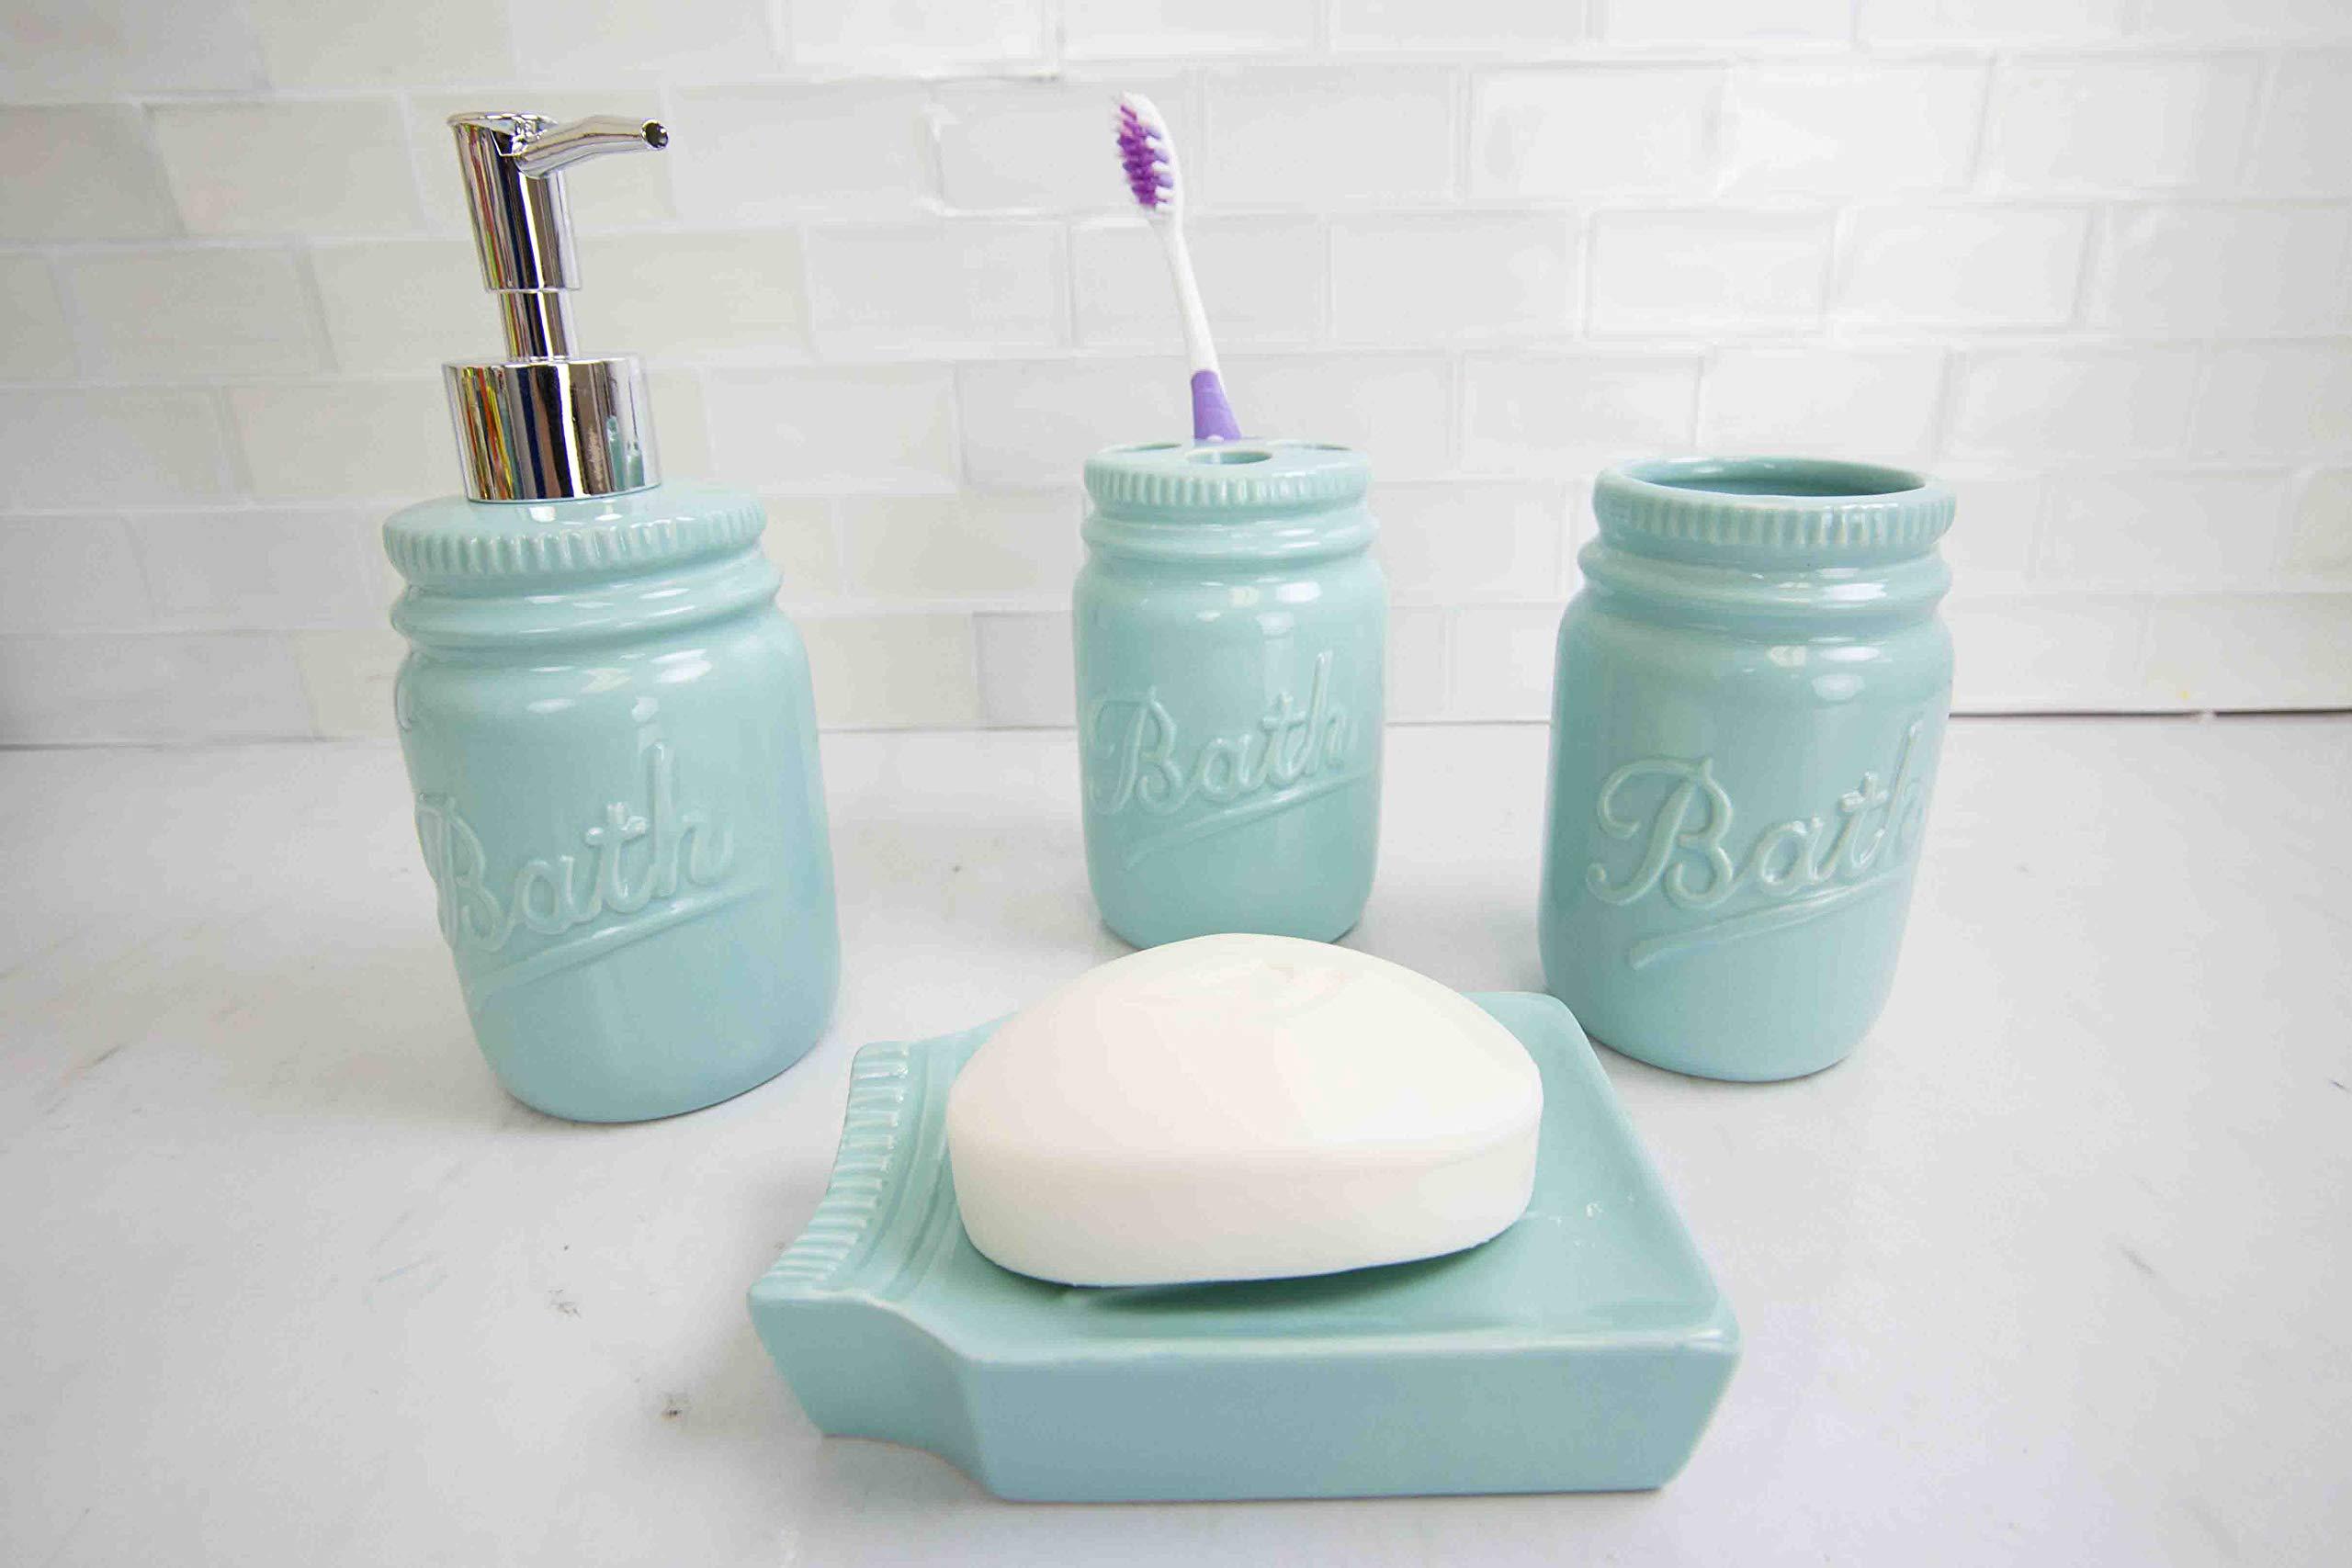 Home Basics Gift & Home Basics Beautiful Rose 4 Pcs Dolomite Mason Jar Durable Bath Accessory Set-Decorative Lotion Dispenser/Dish/Tumbler/Toothbrush Holder Perfect Gift & Decorating Idea, Mint